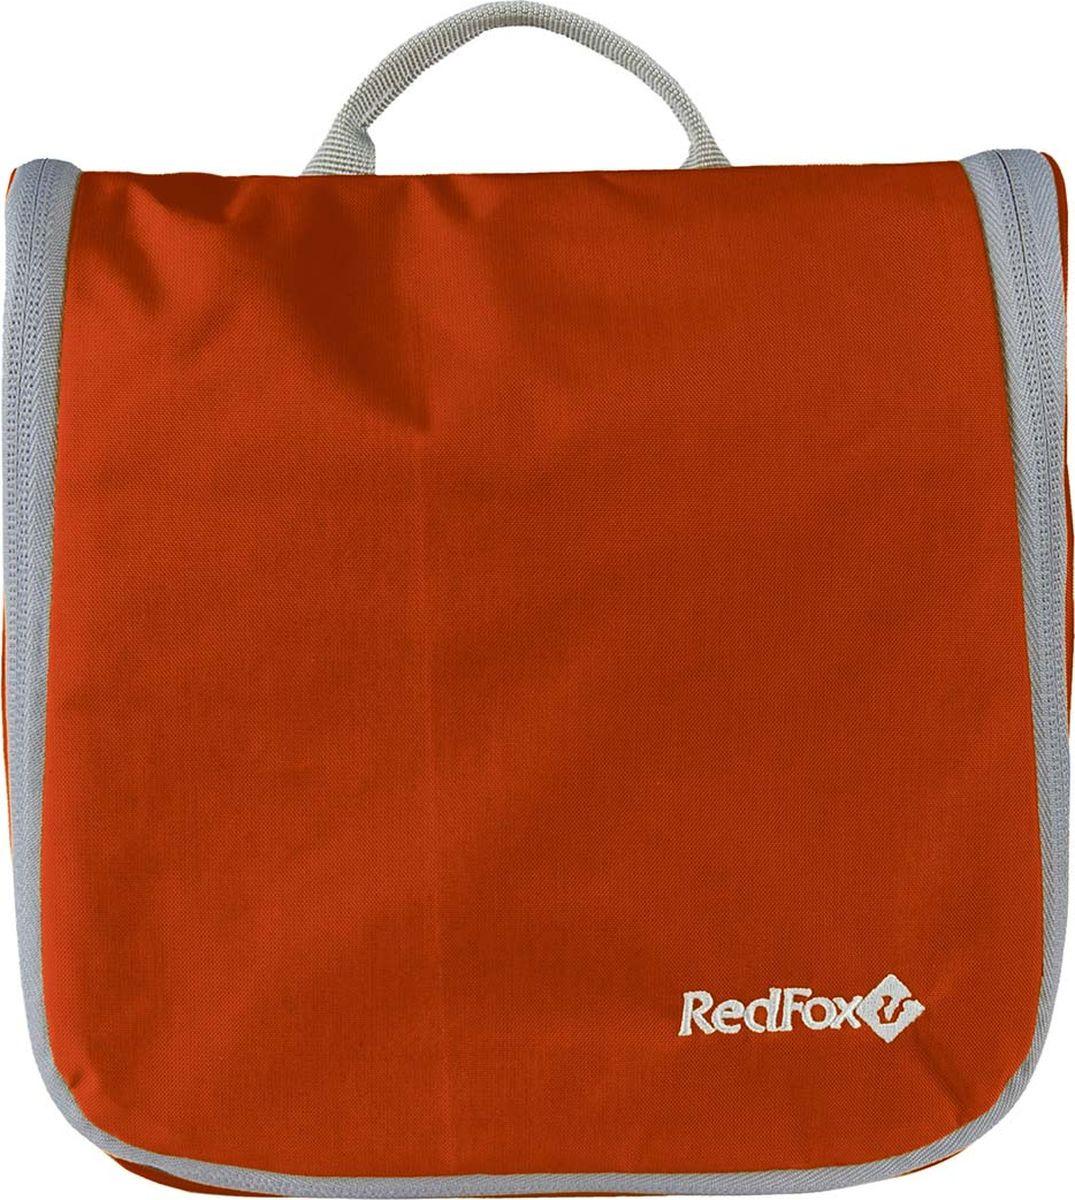 Сумка дорожная Red Fox Voyager L, 1046752, оранжевый, 44 х 20 х 8 см сарафан fox hd